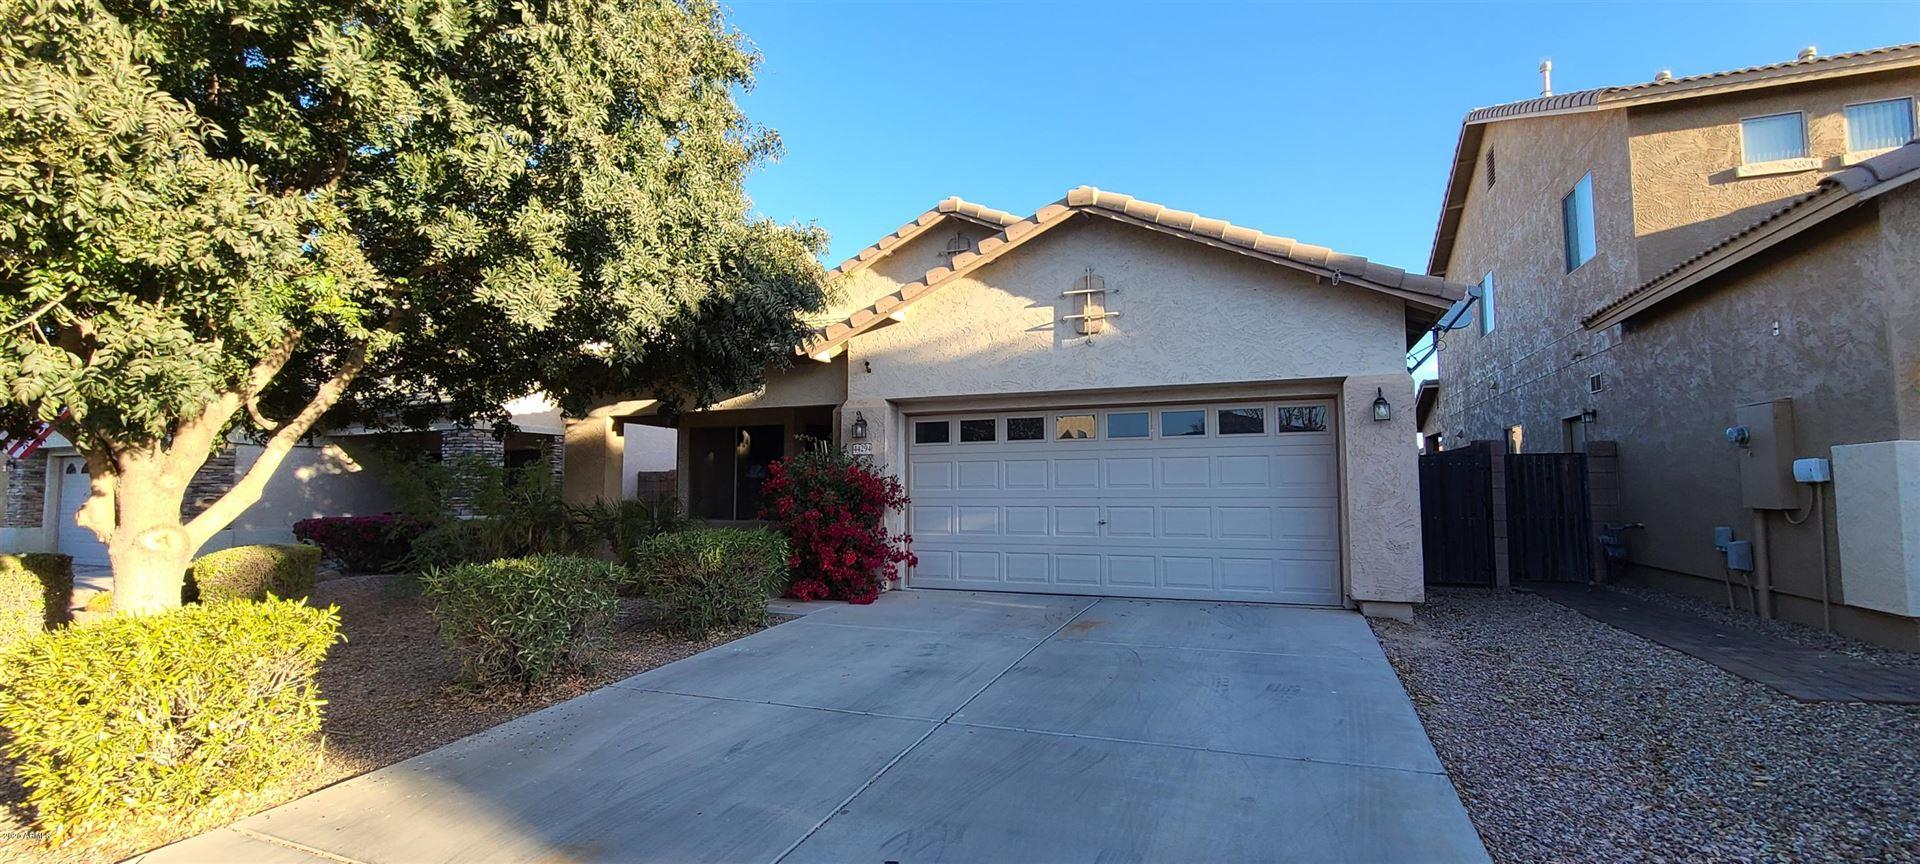 44294 W RHINESTONE Road, Maricopa, AZ 85139 - MLS#: 6166485